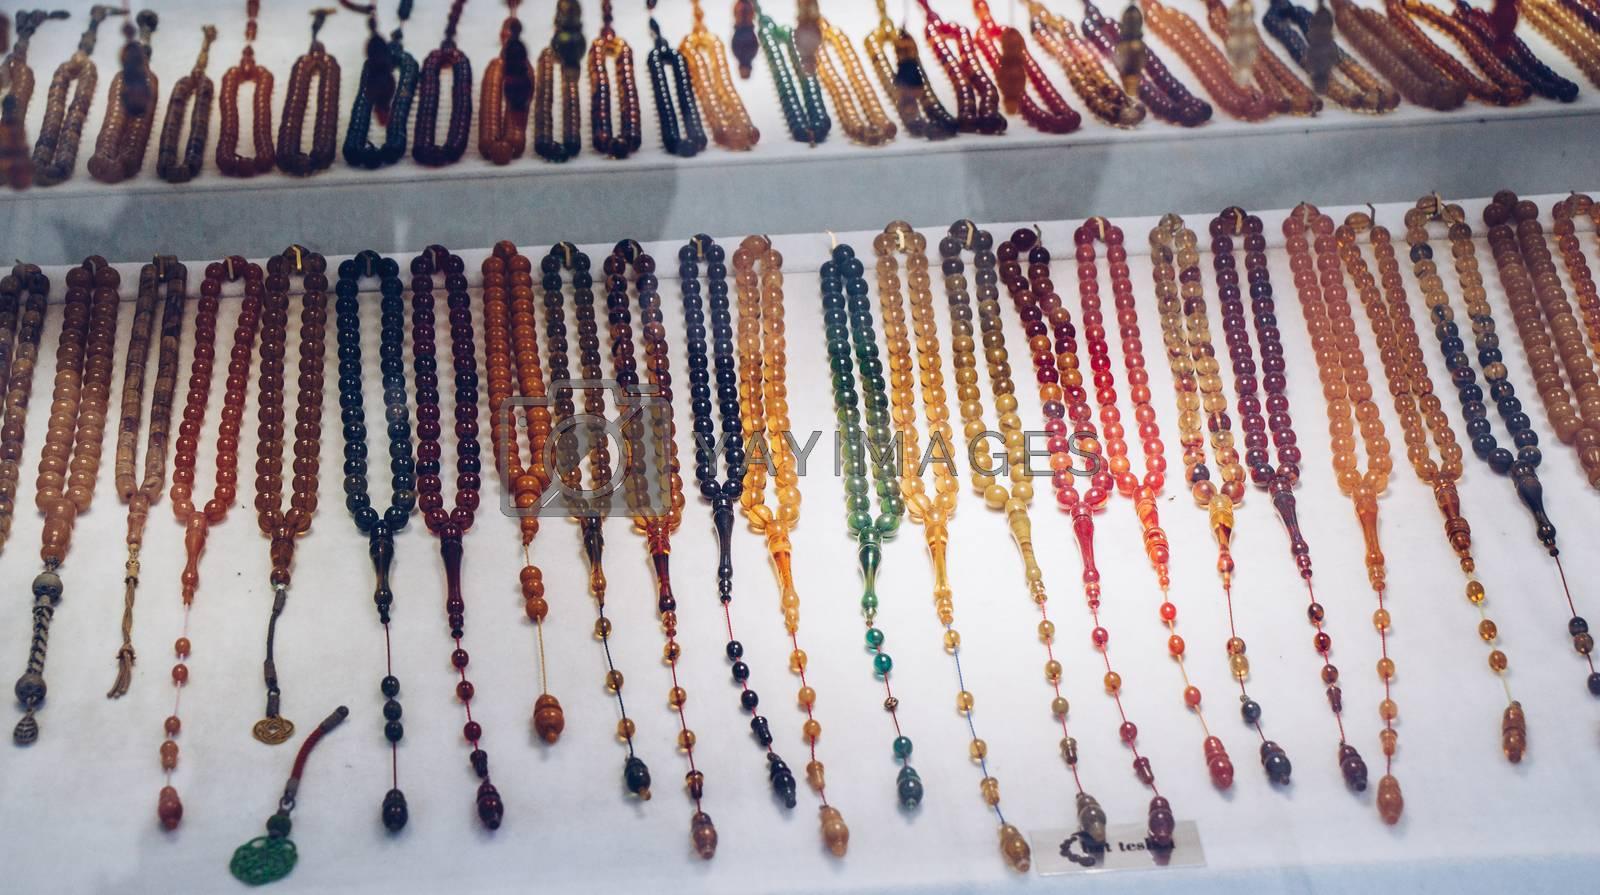 Set of praying beads of various colors